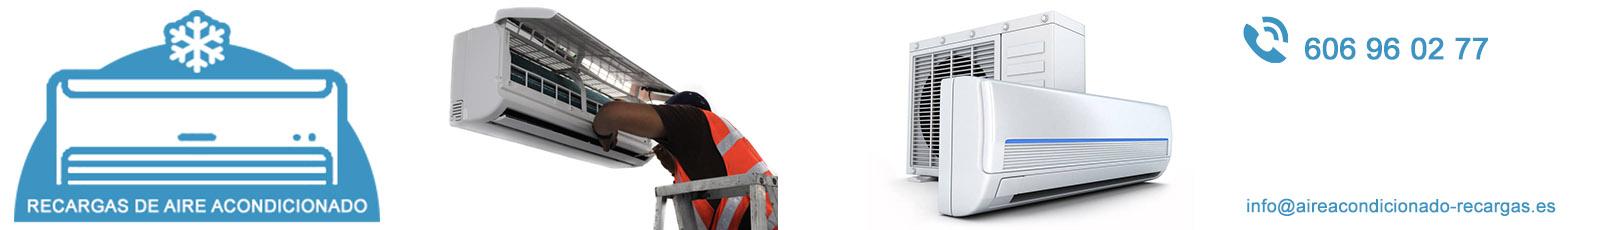 Instalación de Cámaras Frigorificas Industriales Recargas e Instalación de Aire Acondicionado